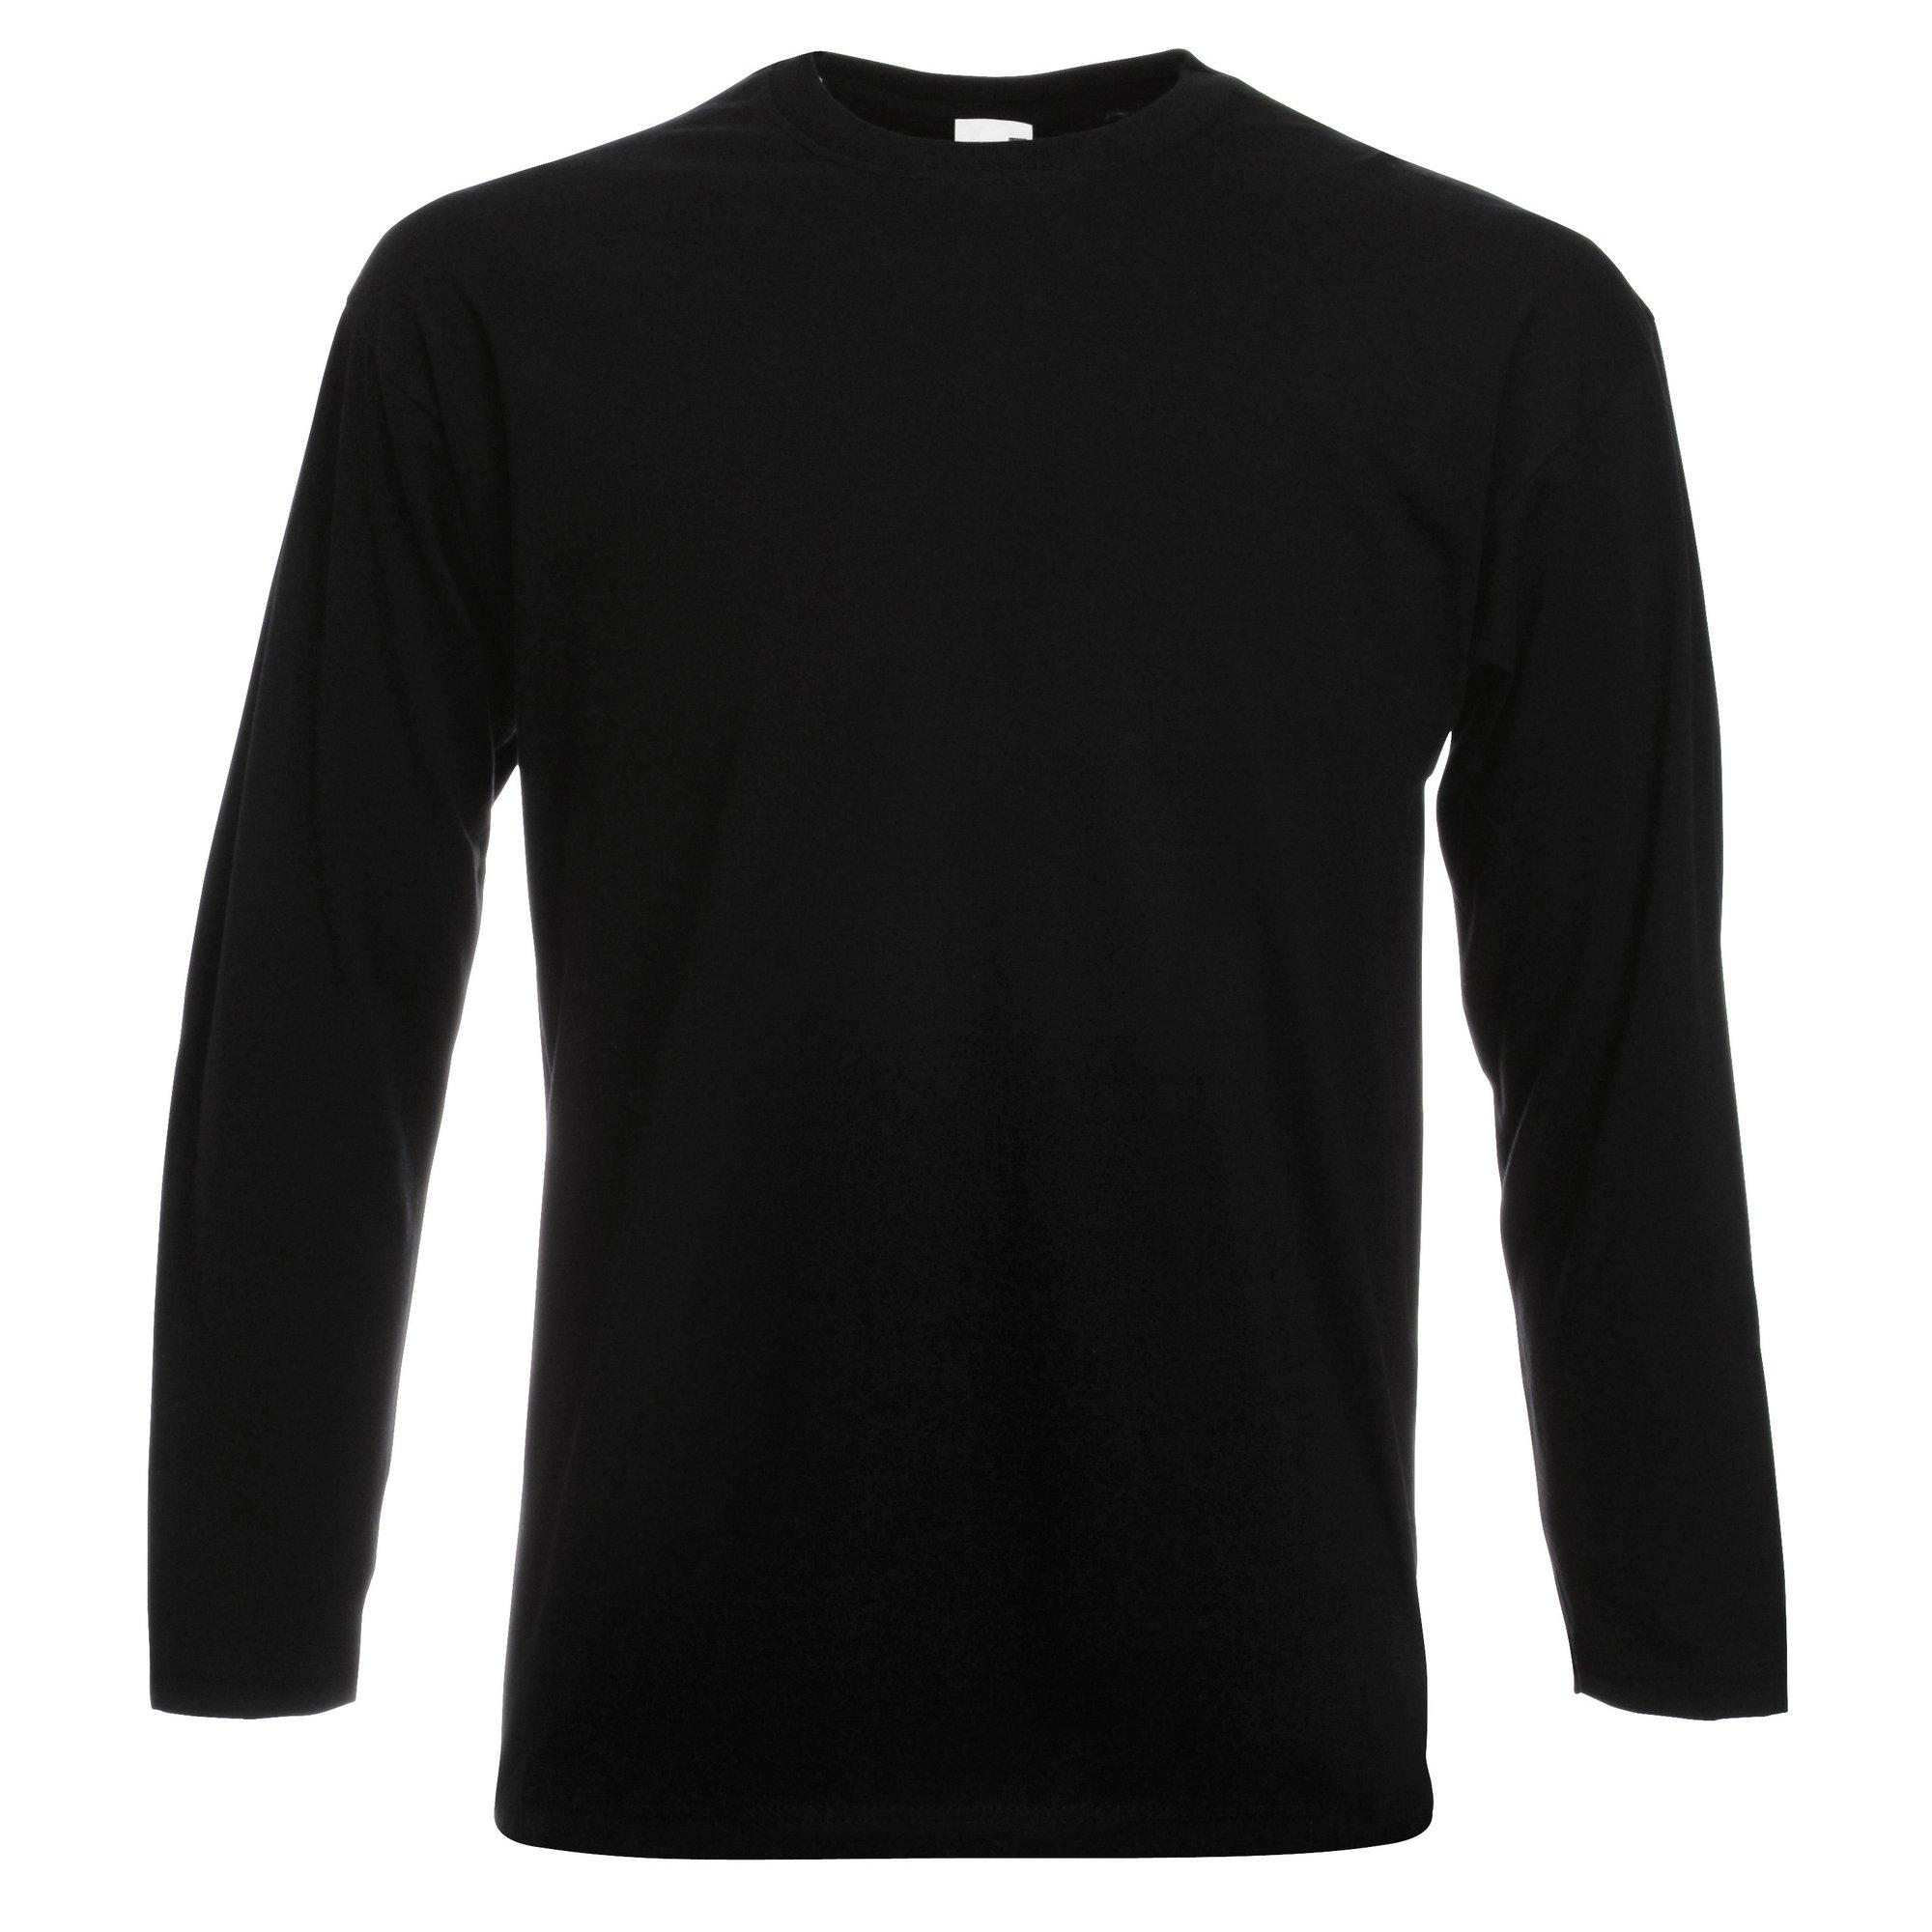 Fruit of the Loom longsleeve »Herren Langarm T-Shirt mit Rundhalsausschnitt« - verschillende betaalmethodes